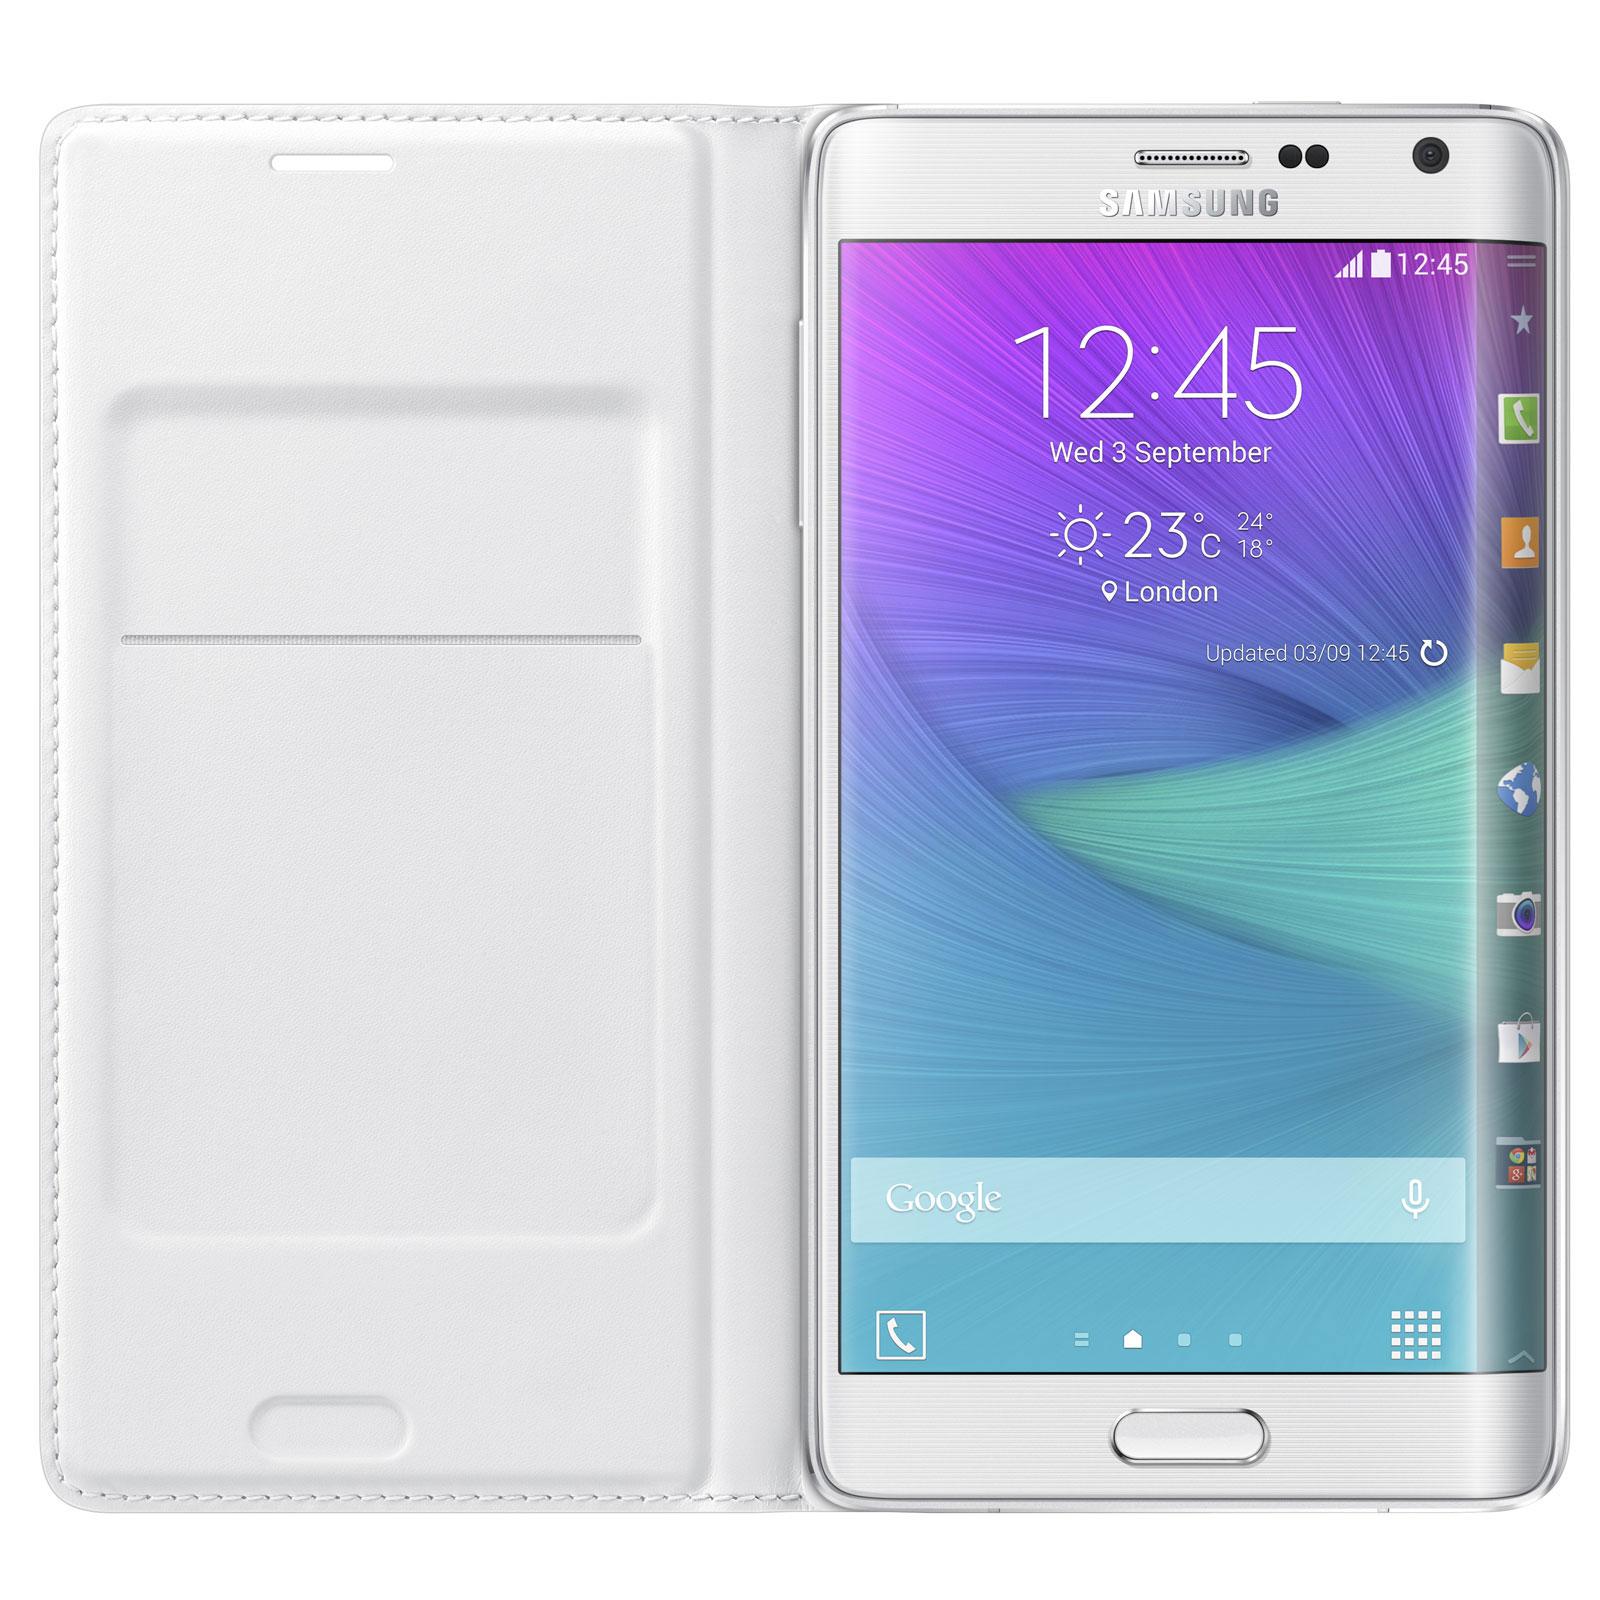 Etui téléphone Samsung Flip Wallet Blanc Samsung Galaxy Note Edge Etui portefeuille pour Samsung Galaxy Core 4G